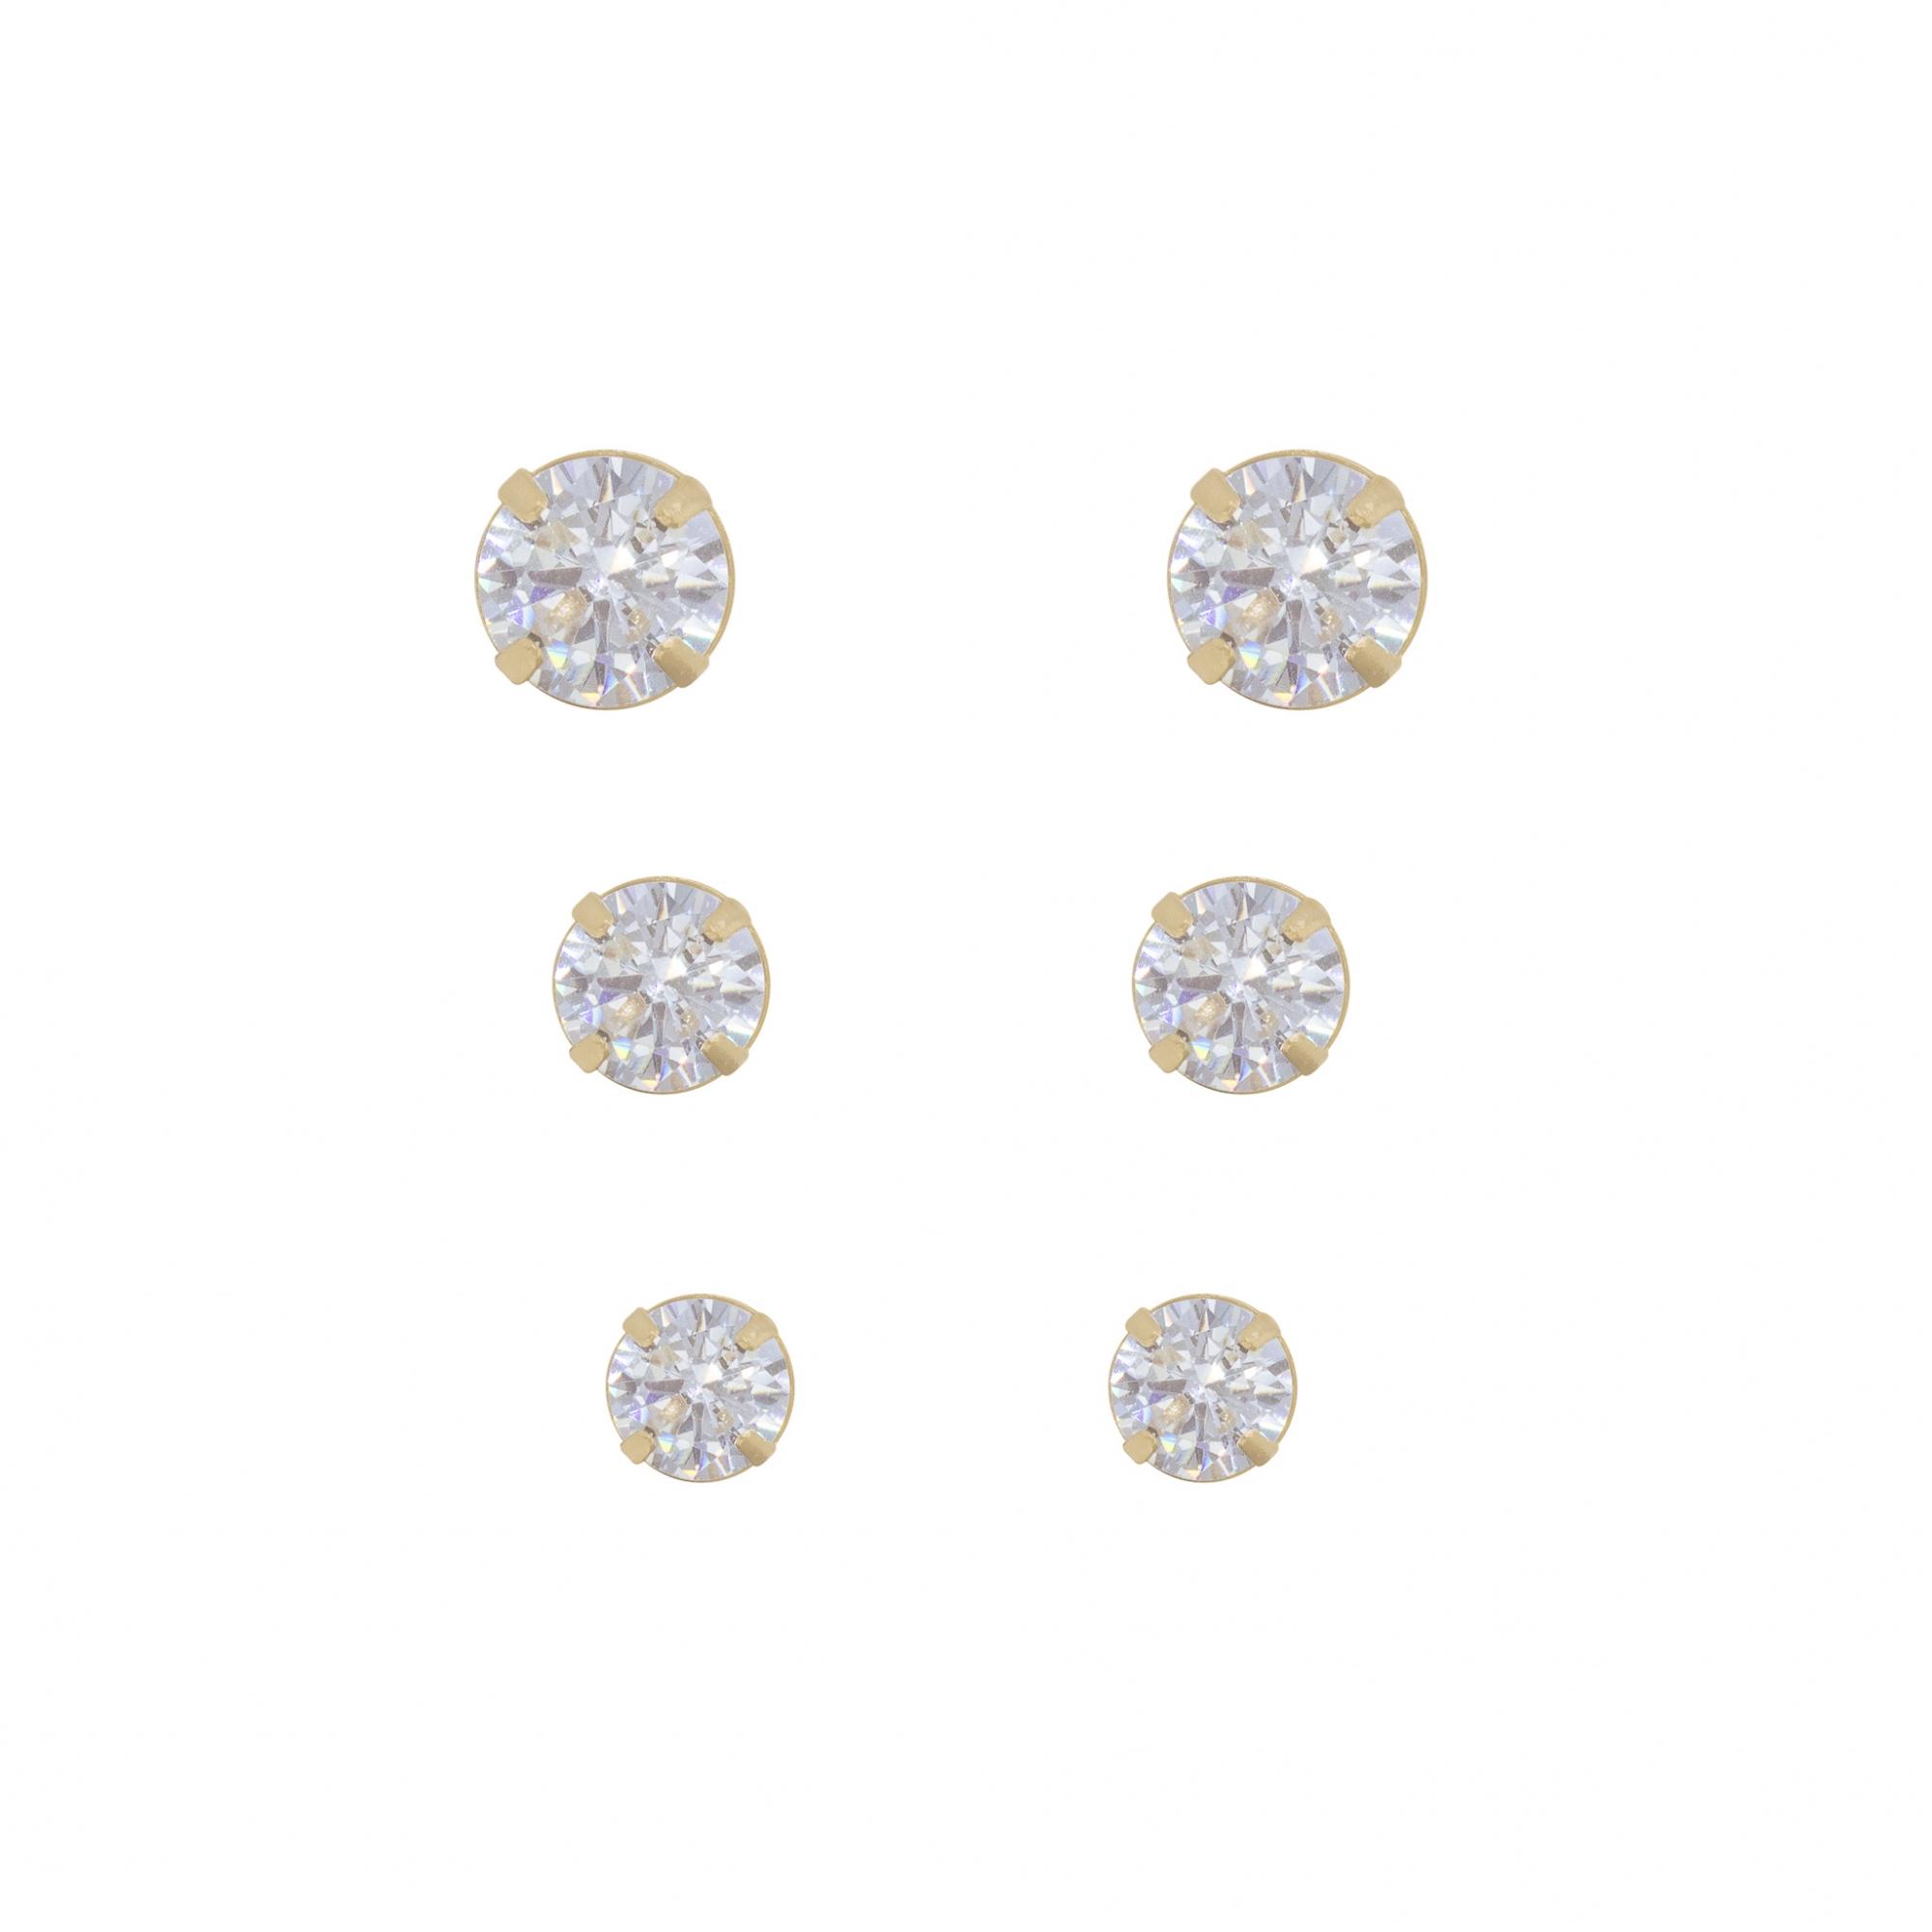 Trio semijoia ponto de luz de zircônia folheada ouro 18k G